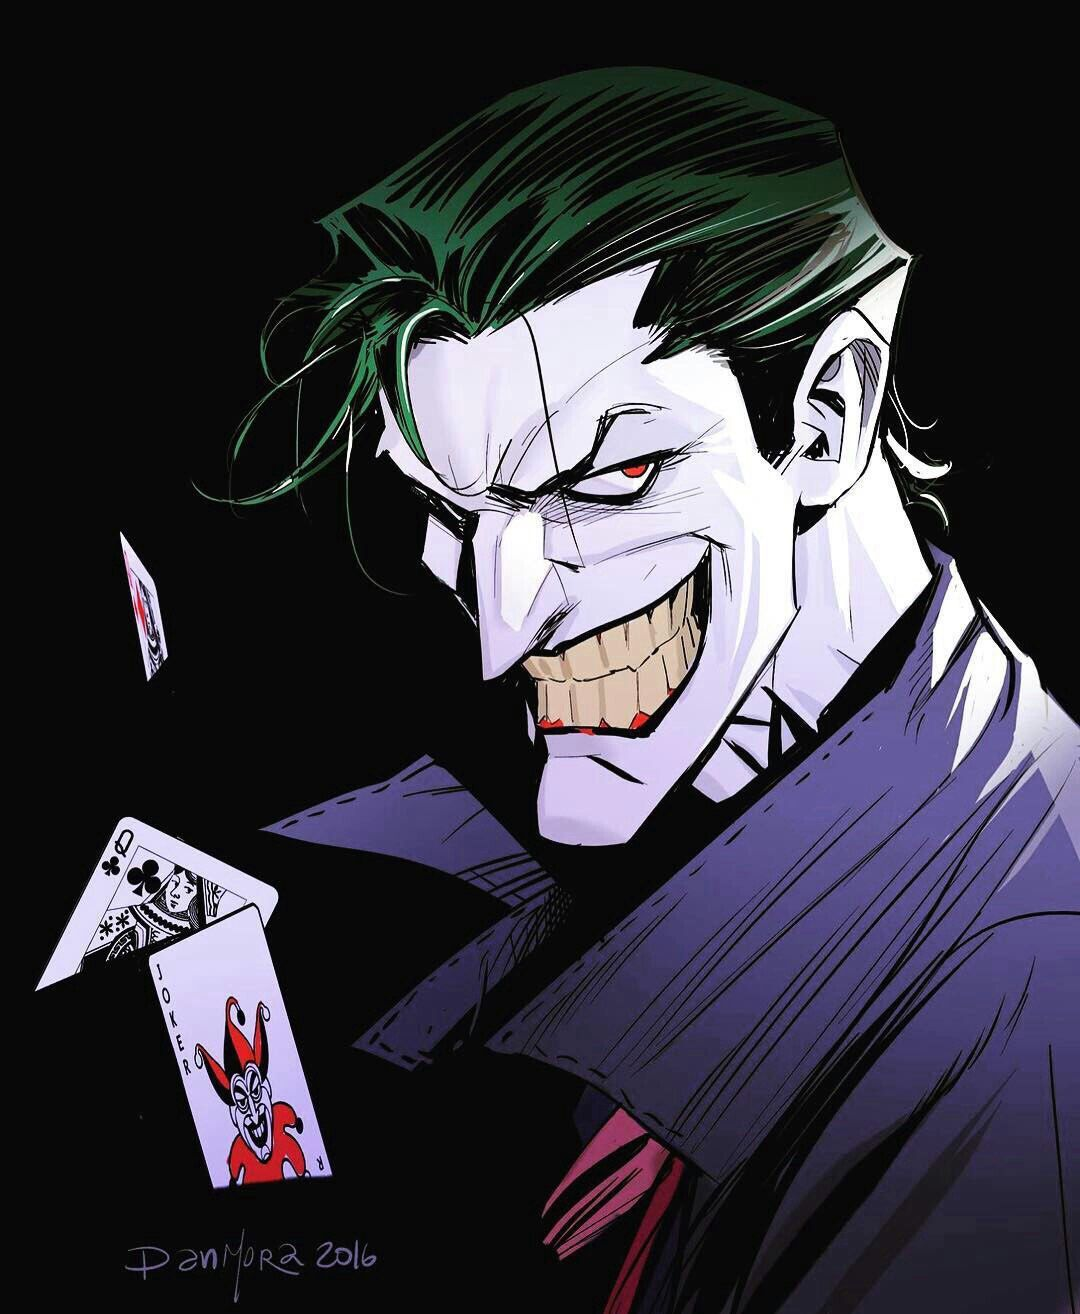 Nothing Up His Sleeve Dan Mora Joker Comic Joker Artwork Joker Drawings